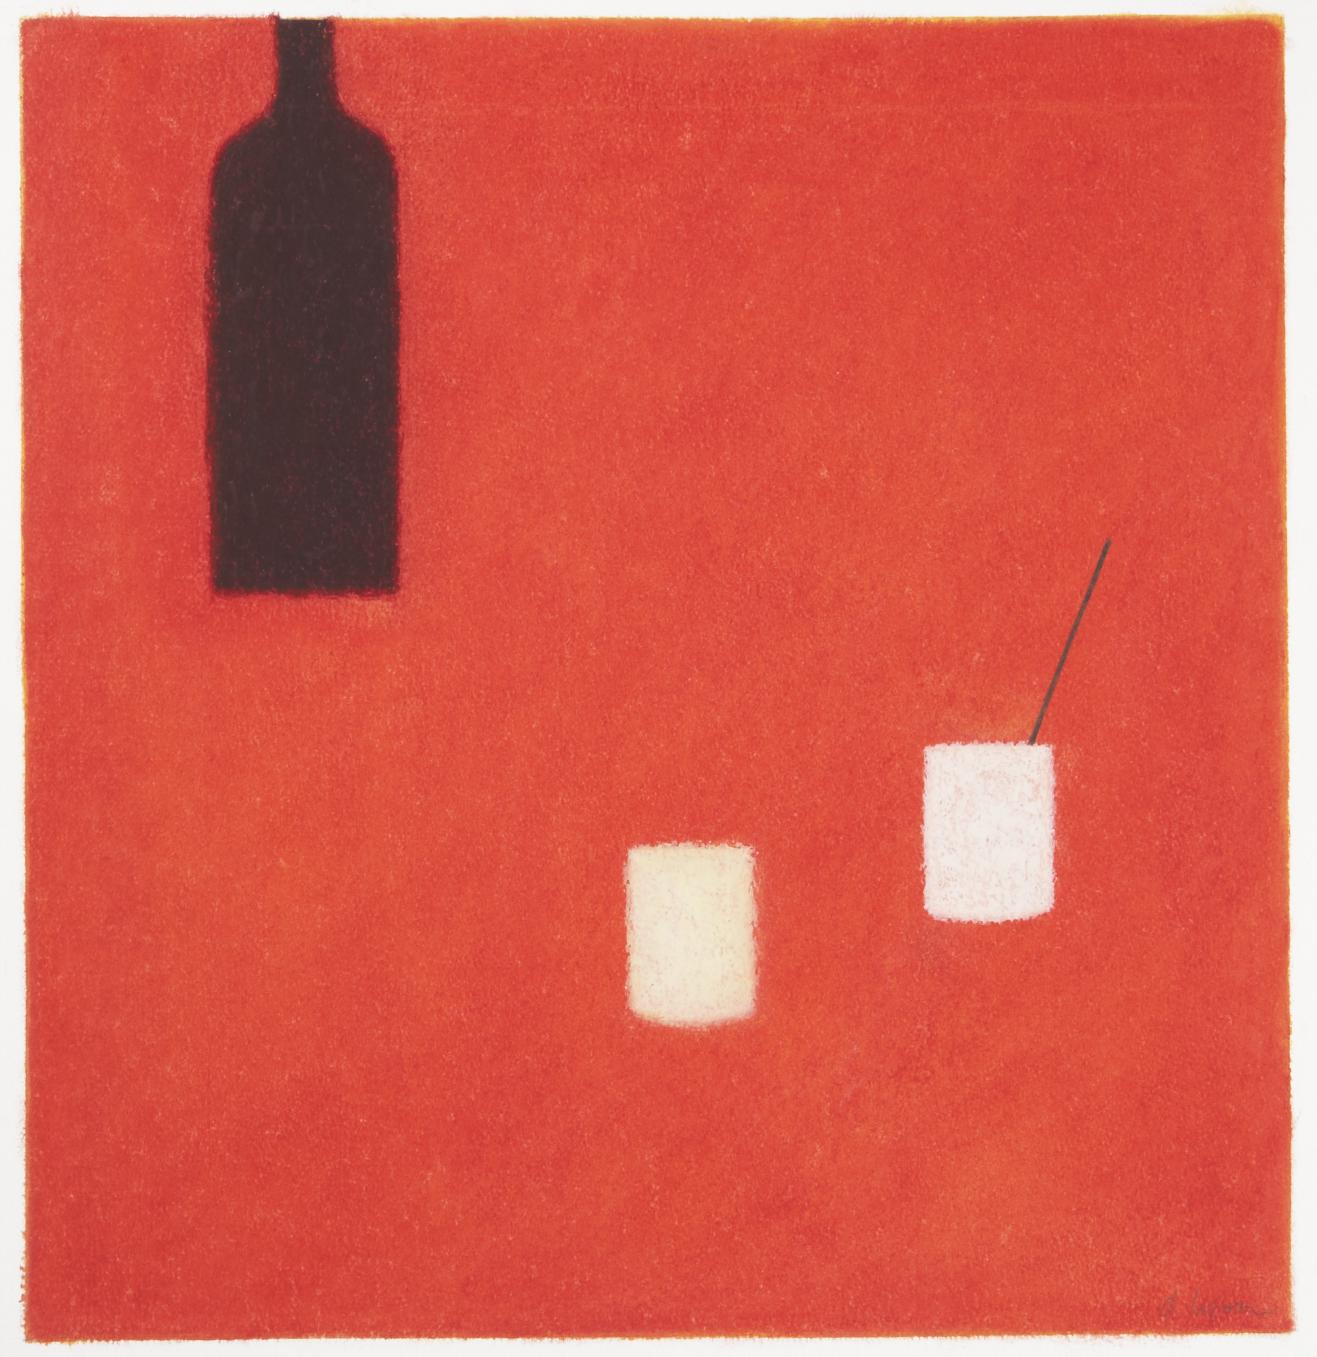 Bottles and Glasses - Oil Pastel